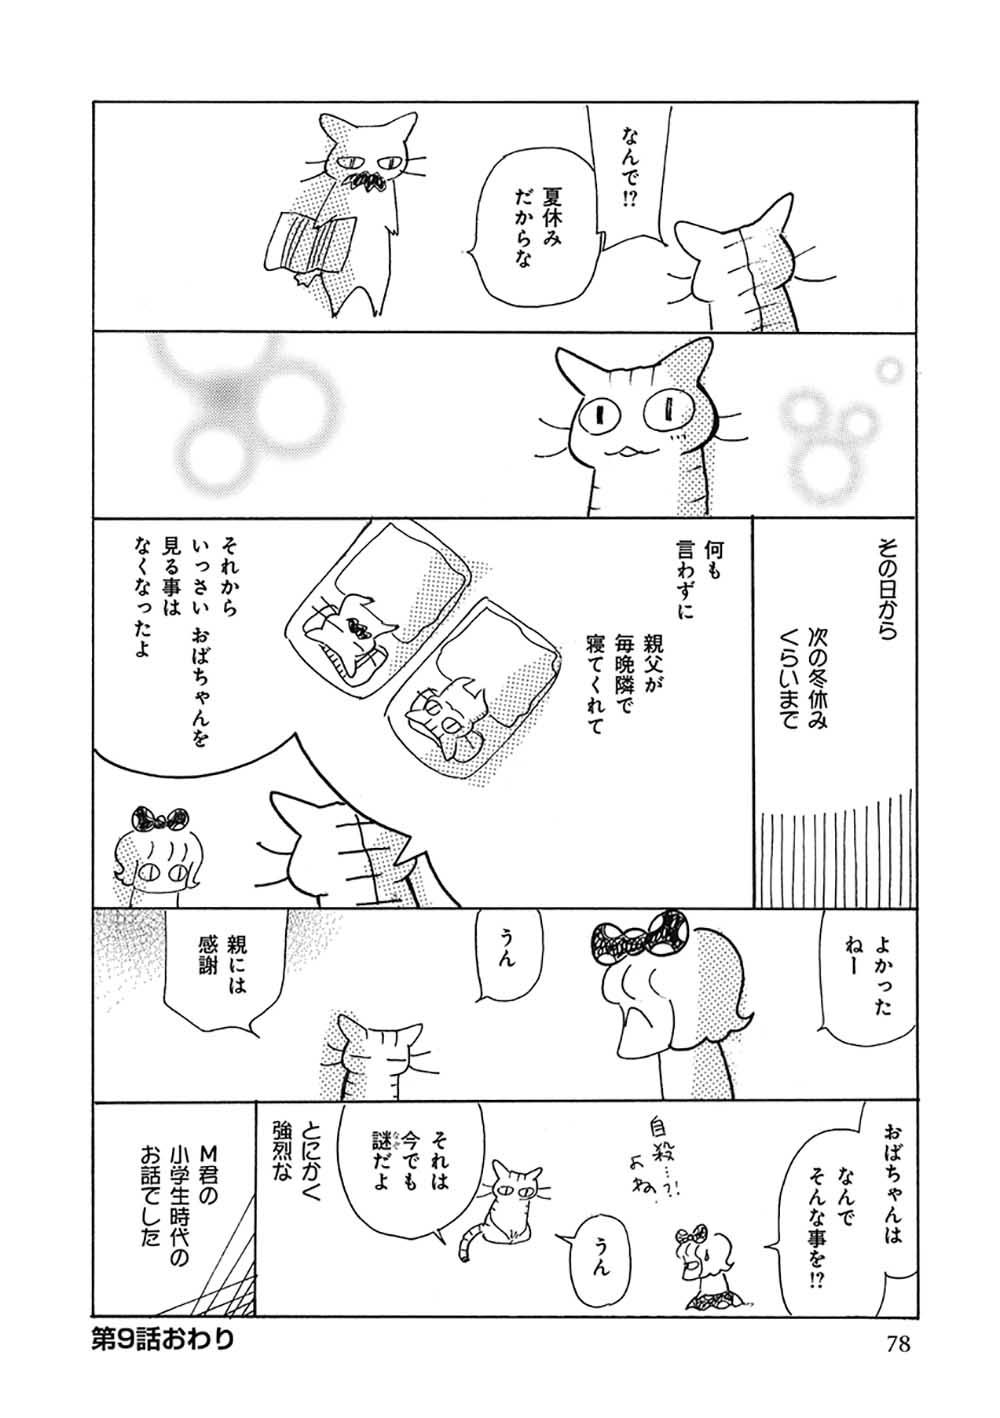 neko1_078ol のコピー.jpg